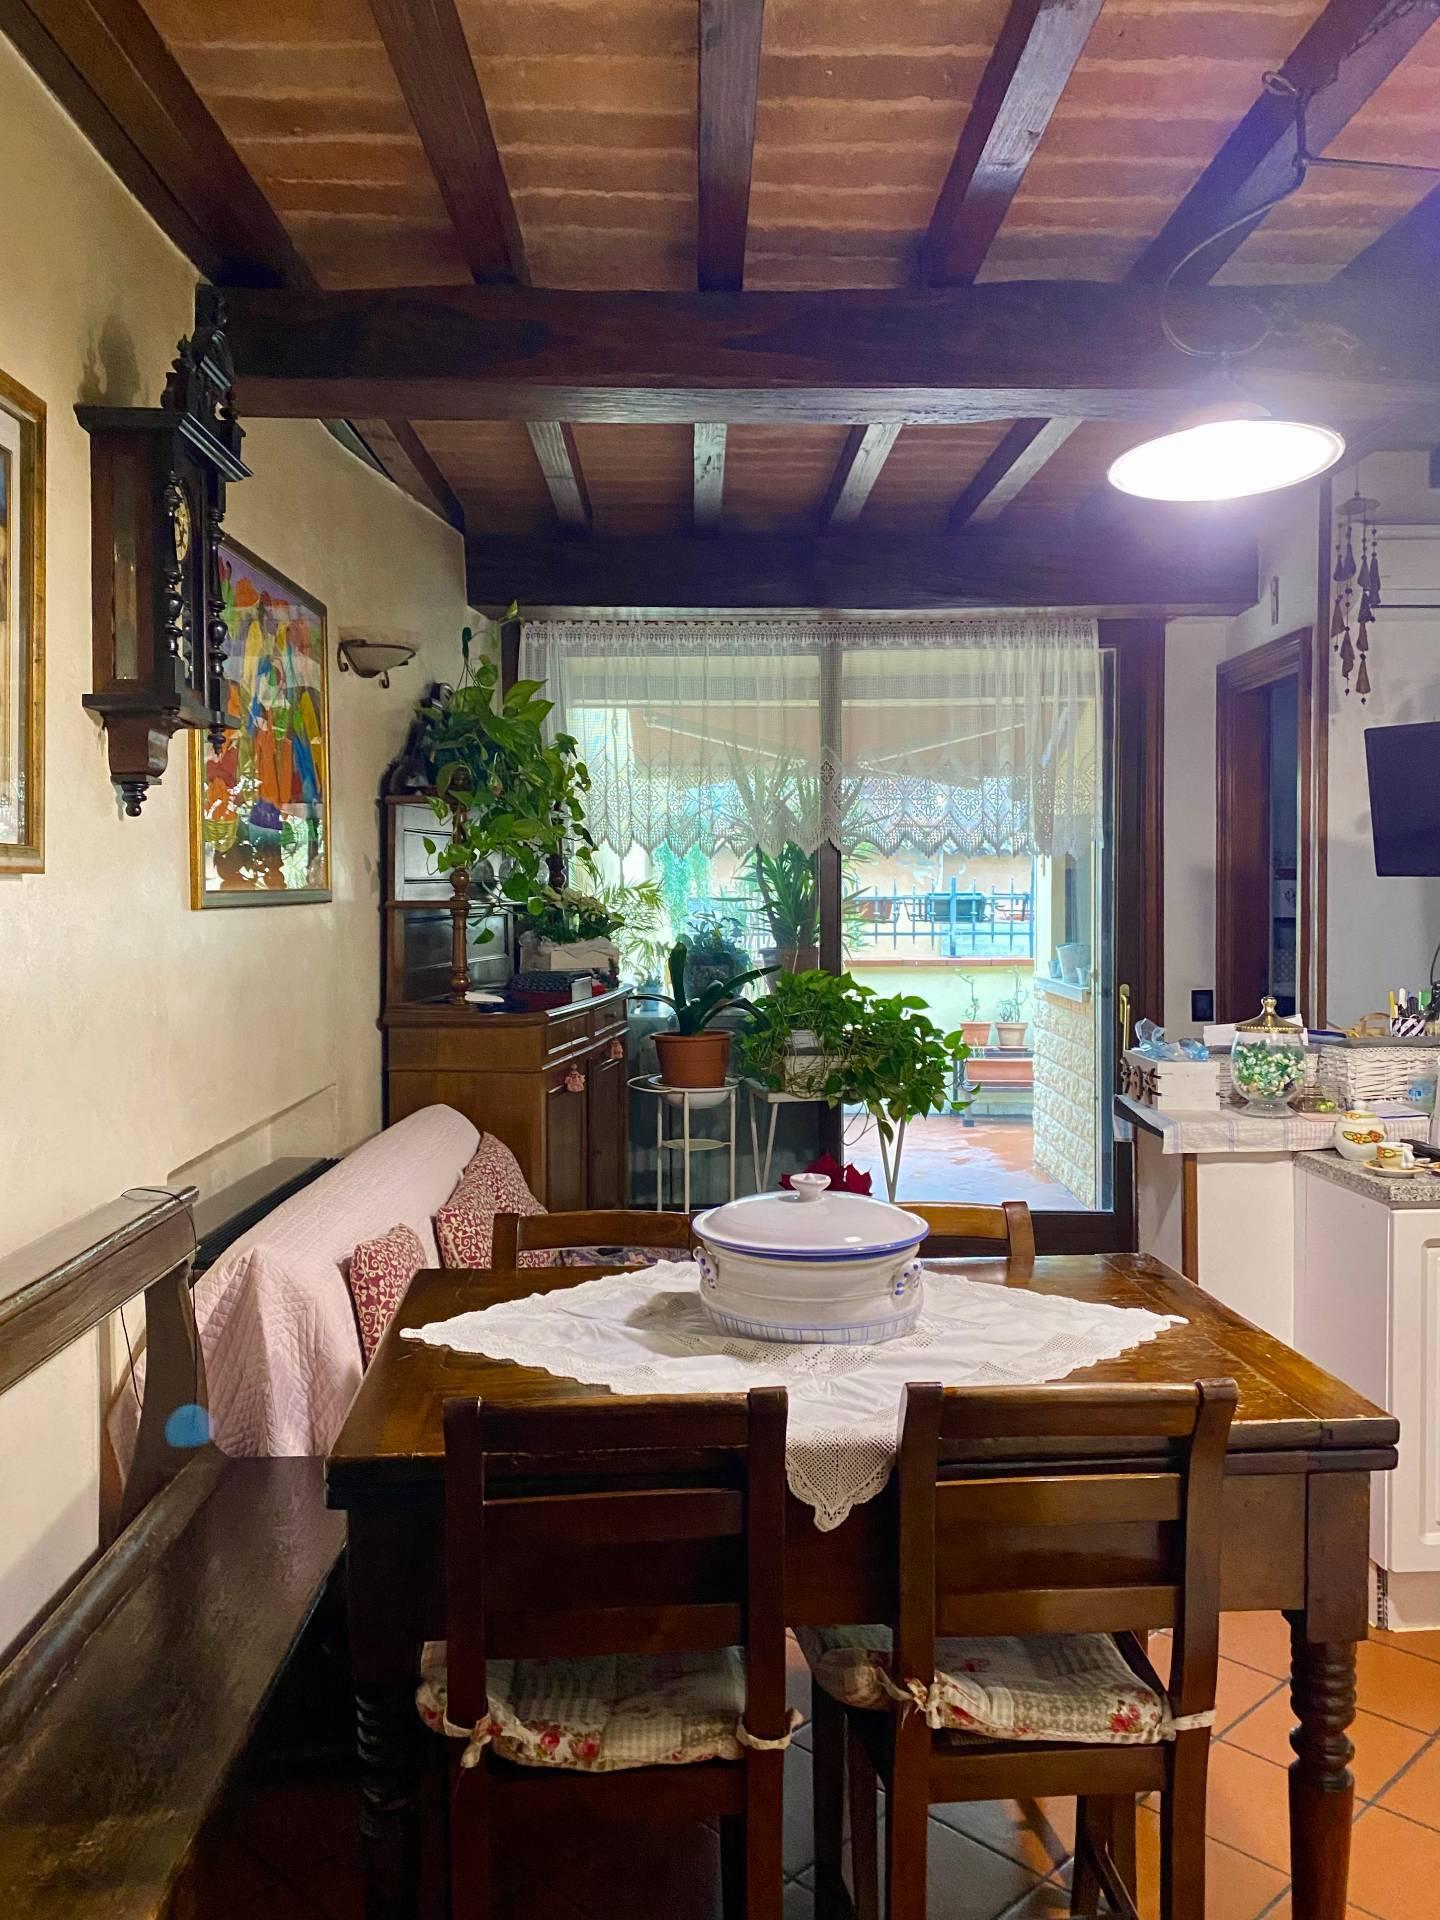 Vendita Casa Indipendente Casa/Villa Mantova 243526